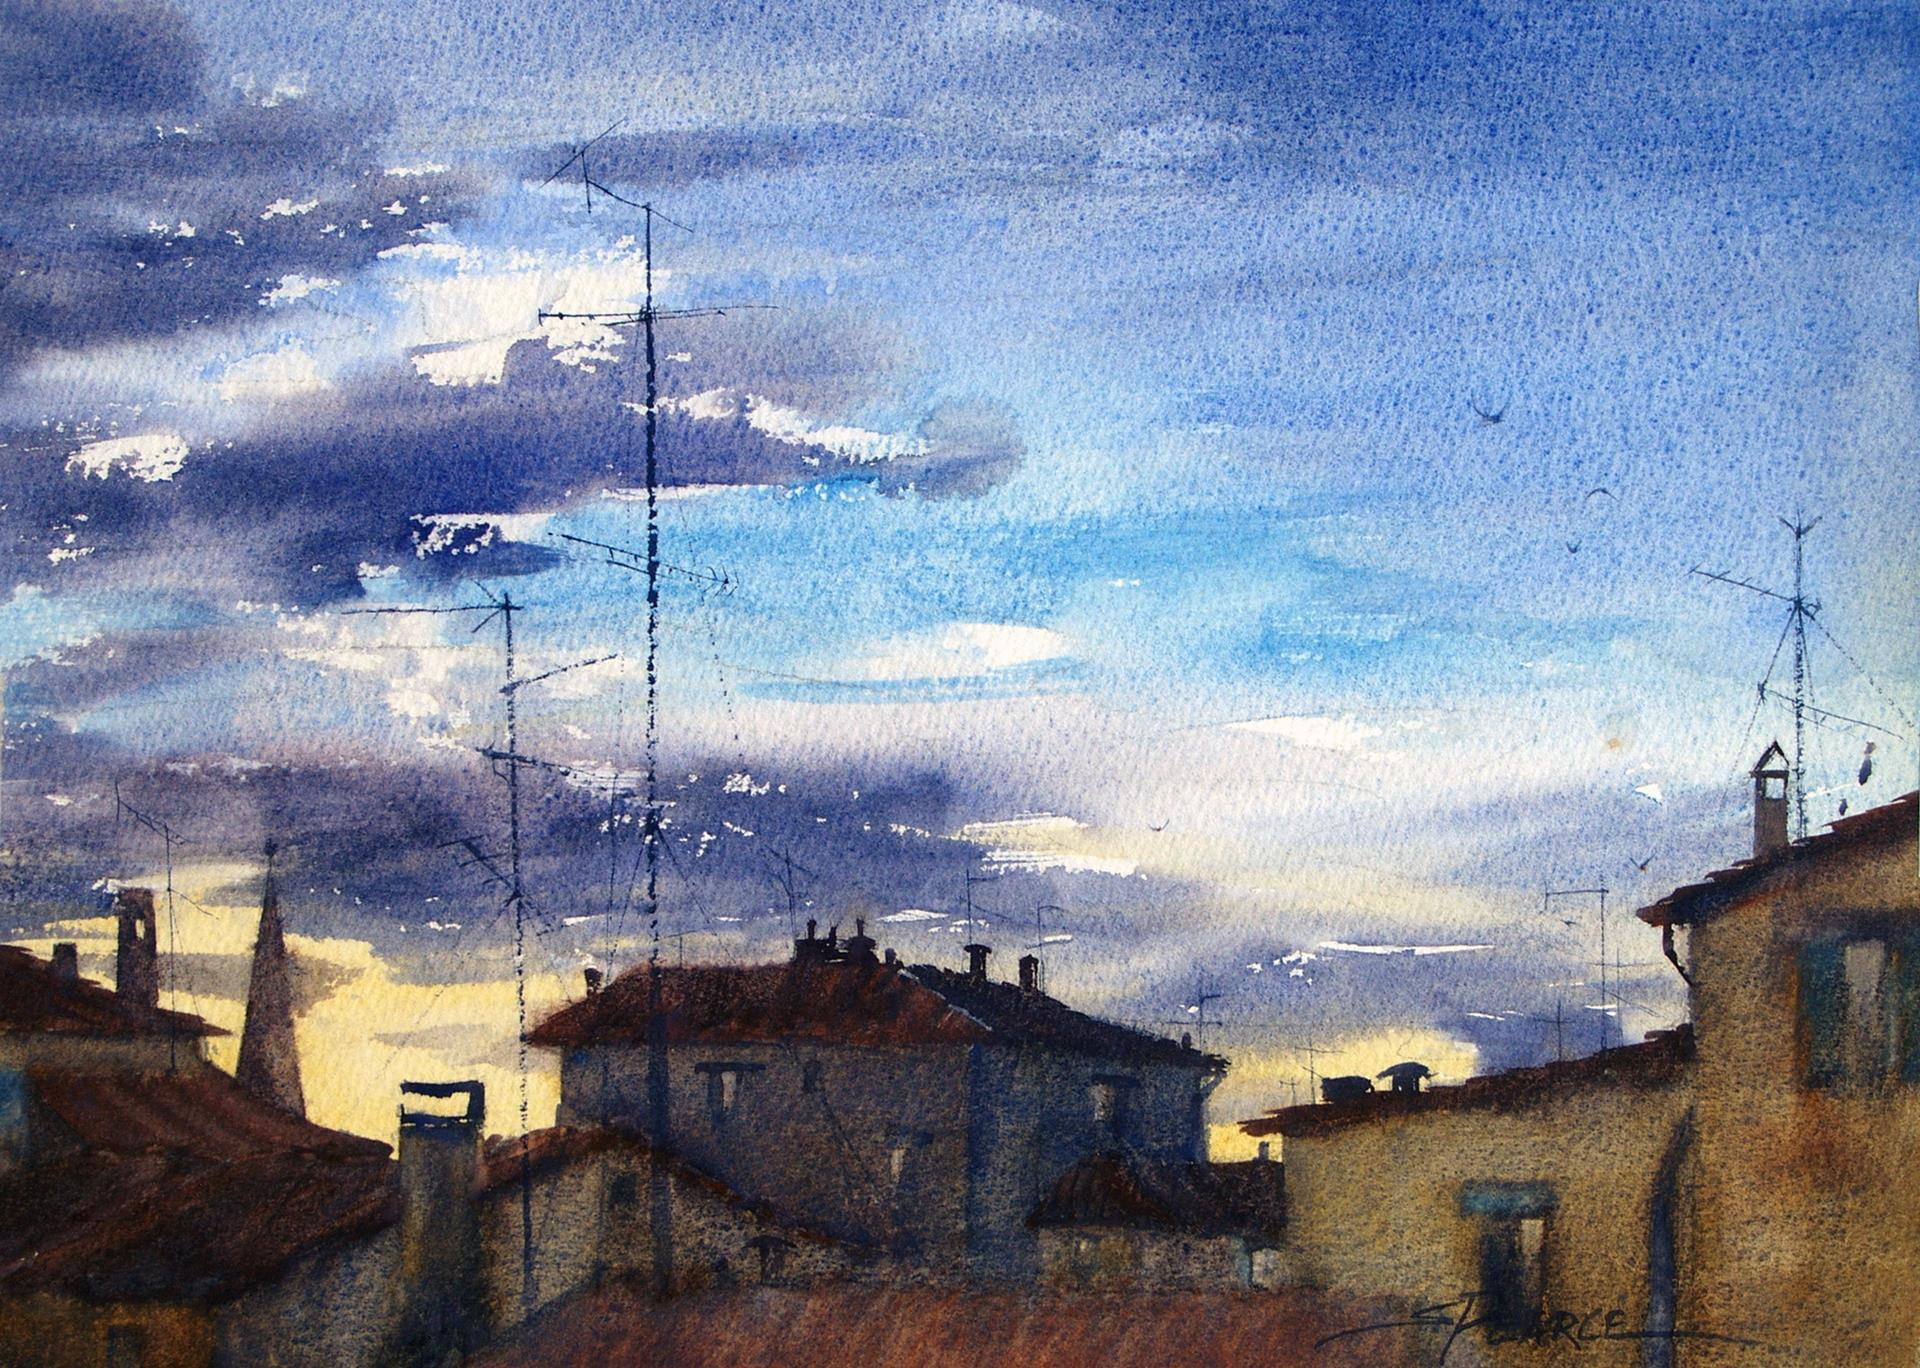 Sandra Pearce, Buonosera a Firenze